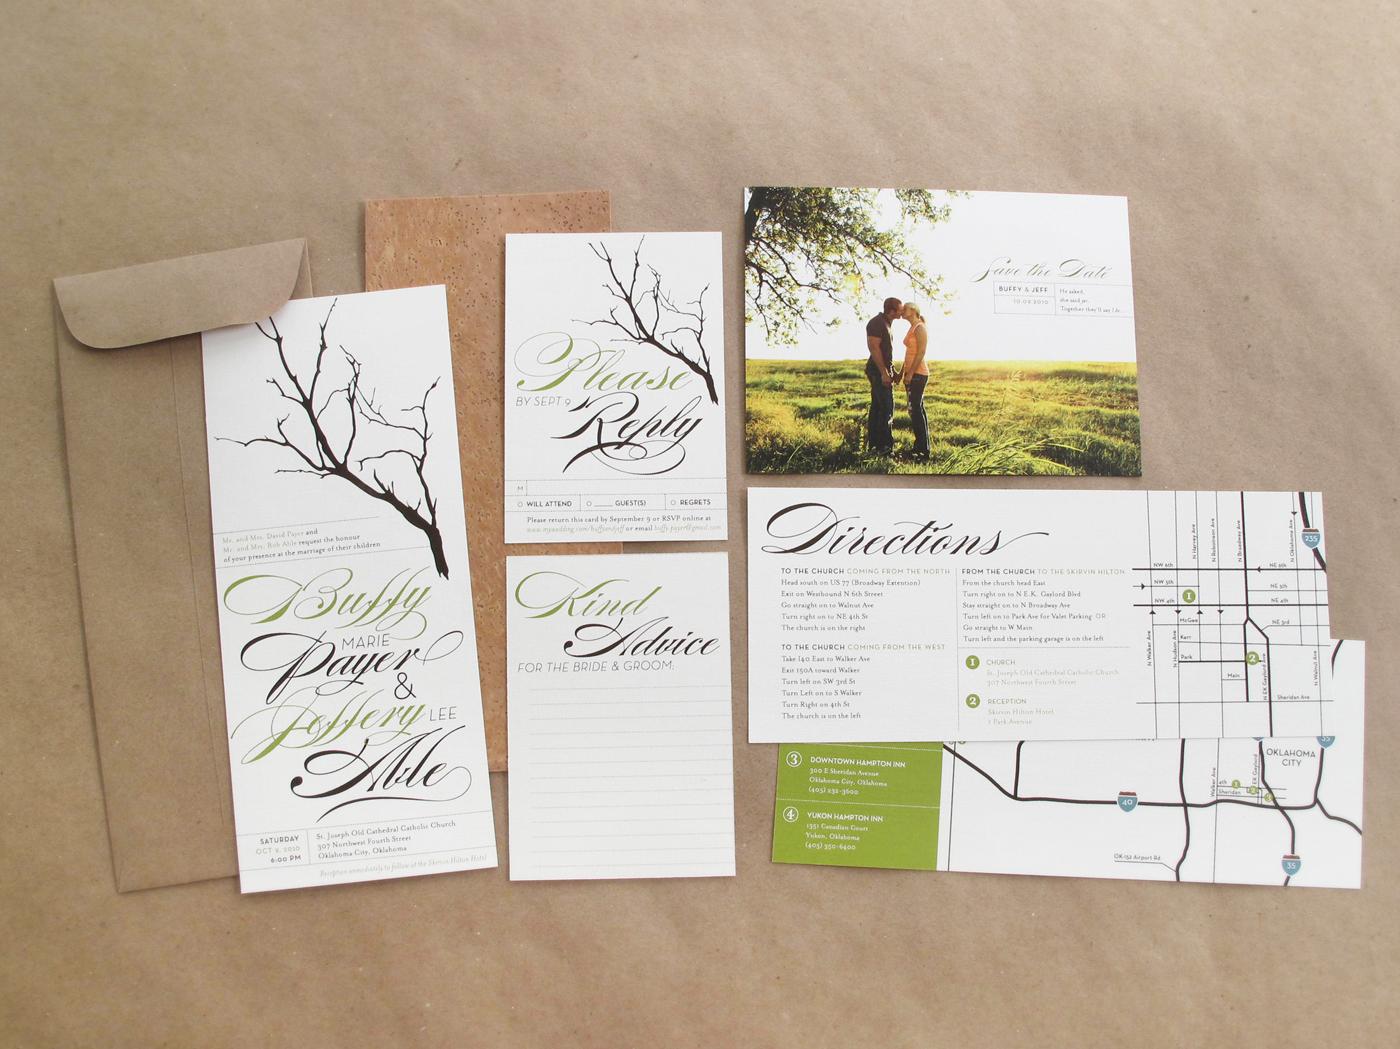 Best Wedding Invitations Cards: Spring Wedding Invitations: The Best Spring Wedding